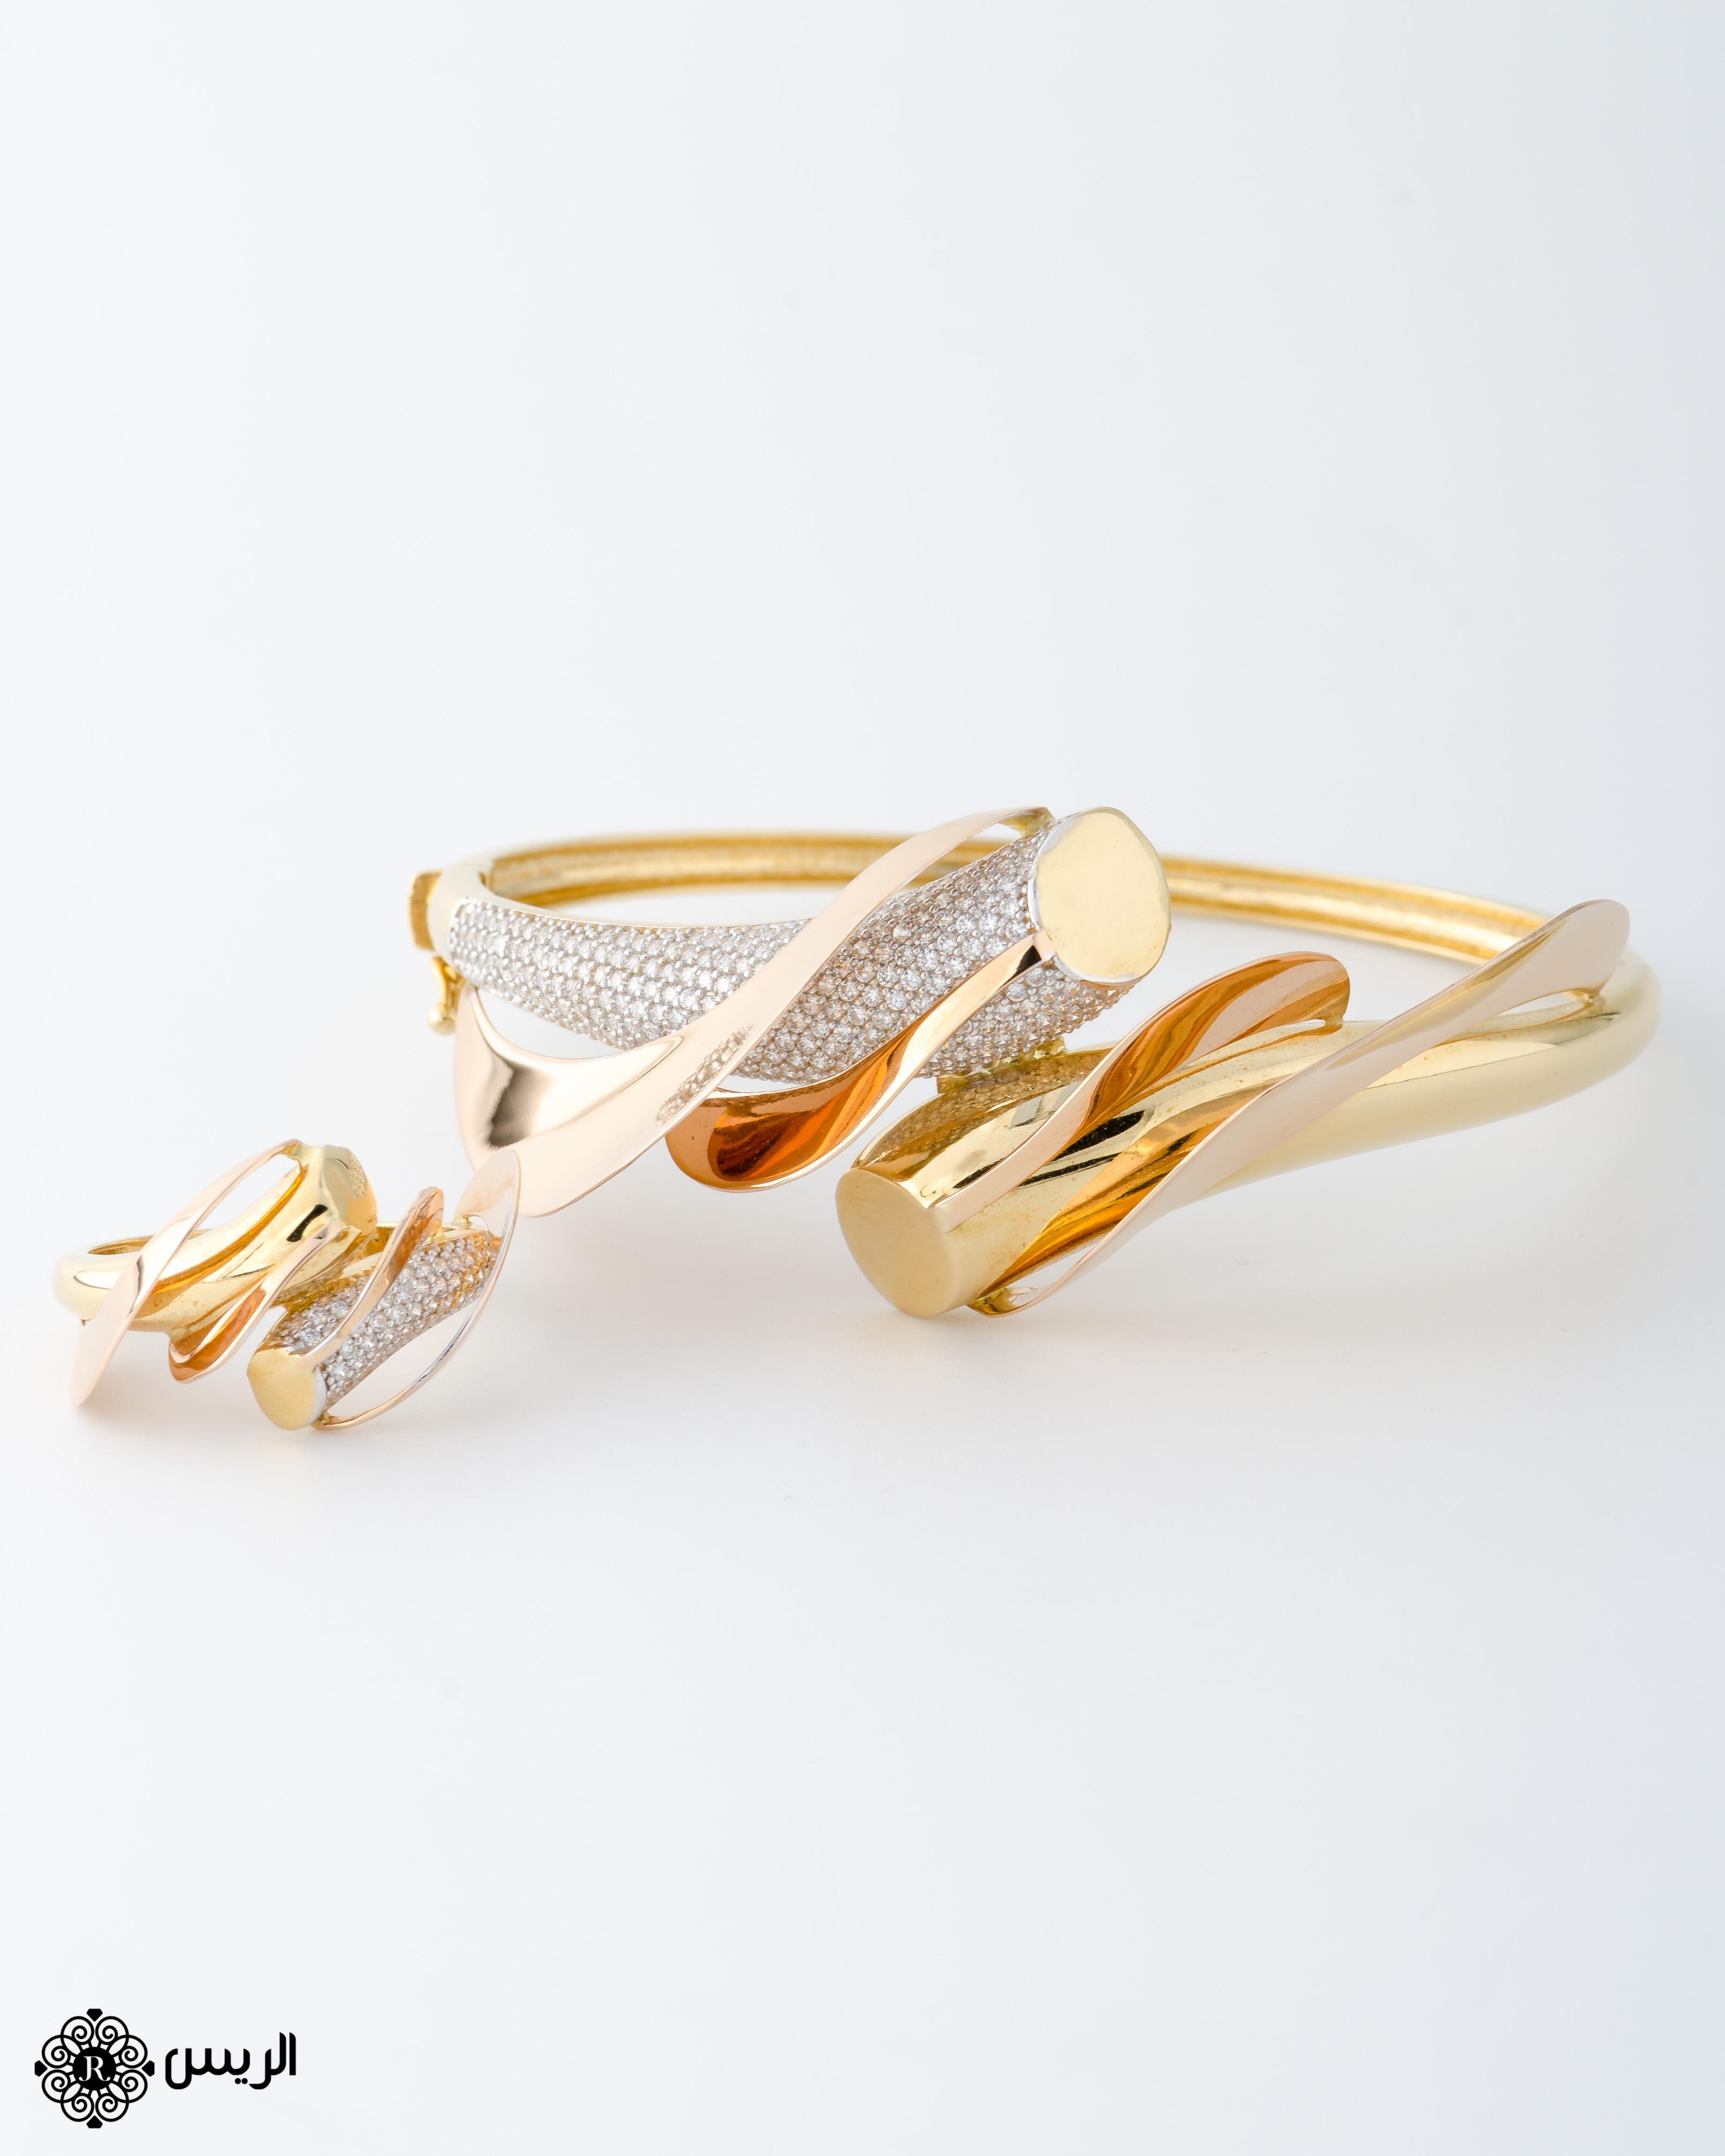 Raies jewelry Bangle with Ring Italian Design إسورة مع خاتم تصميم إيطالي الريس للمجوهرات